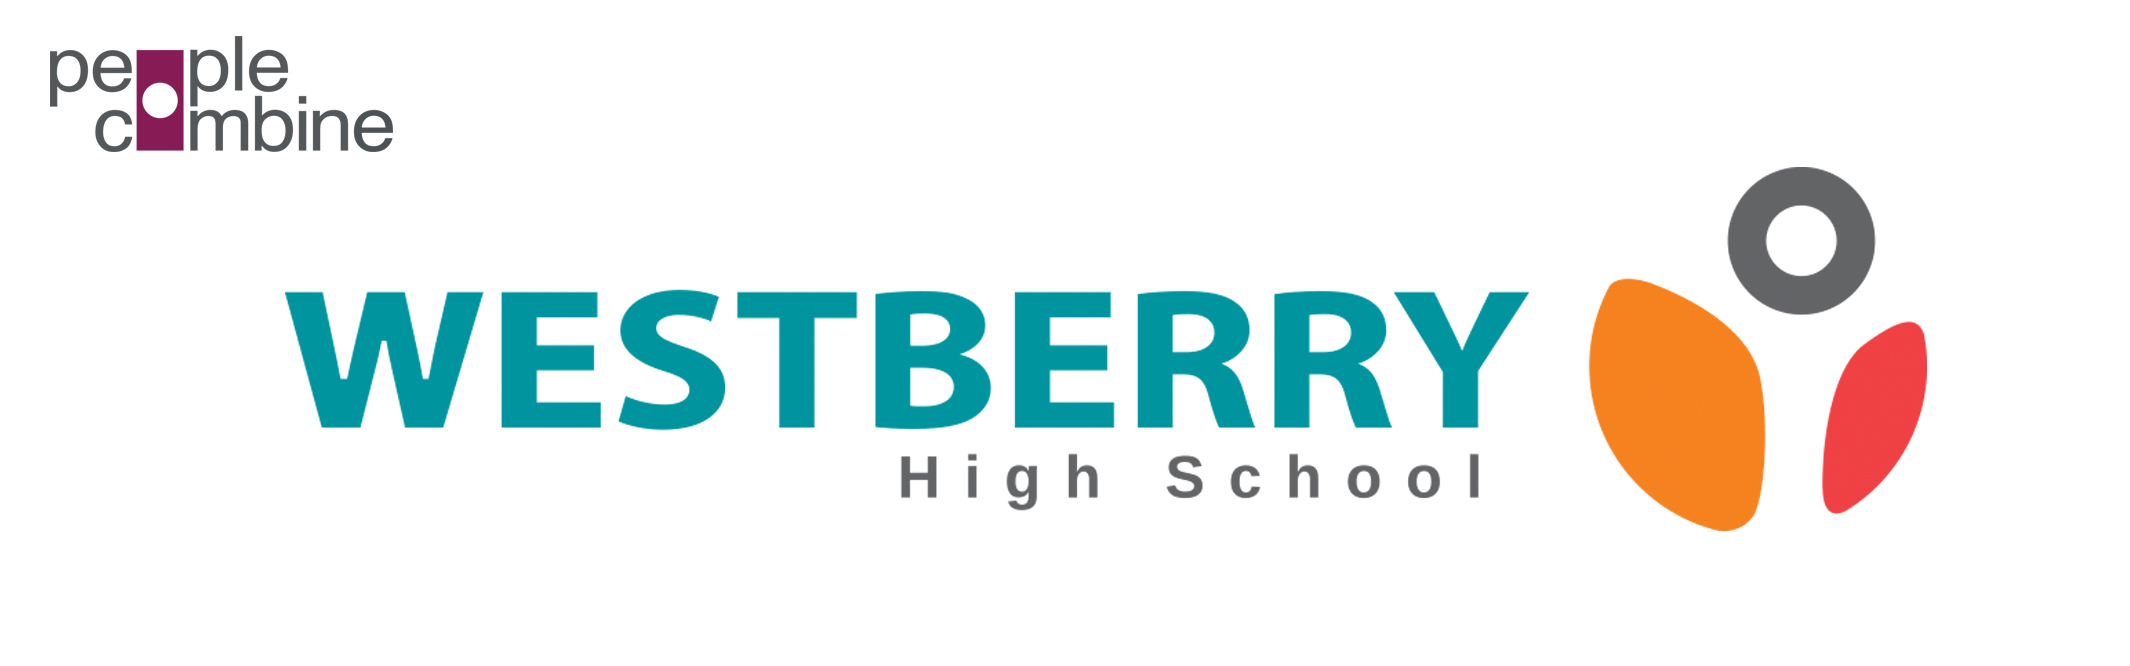 Westberry High School, Bhimavaram